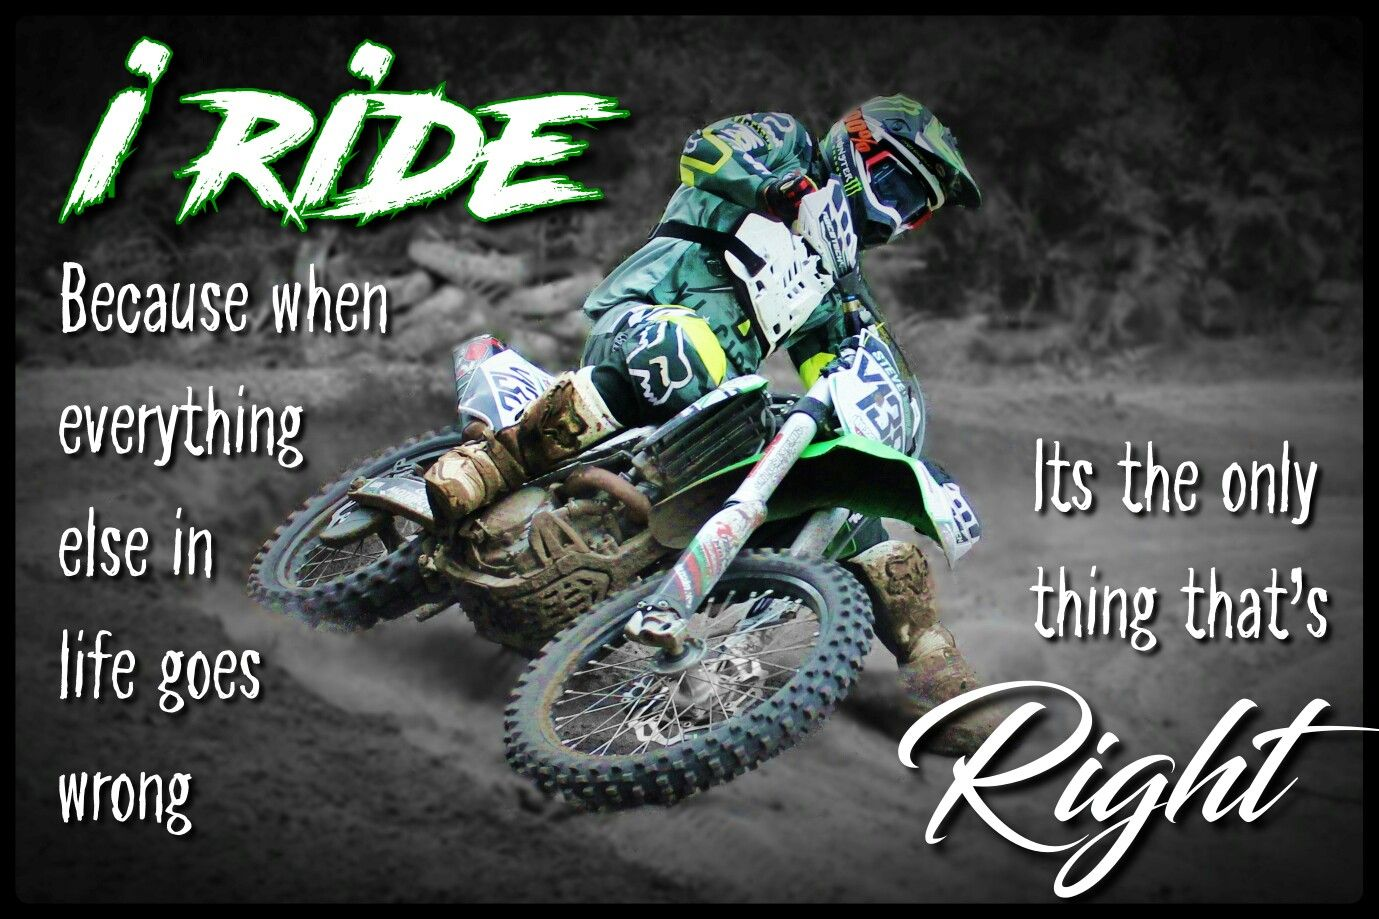 Steve Motocross Quote Dirt Bike Quotes Motocross Quotes Bike